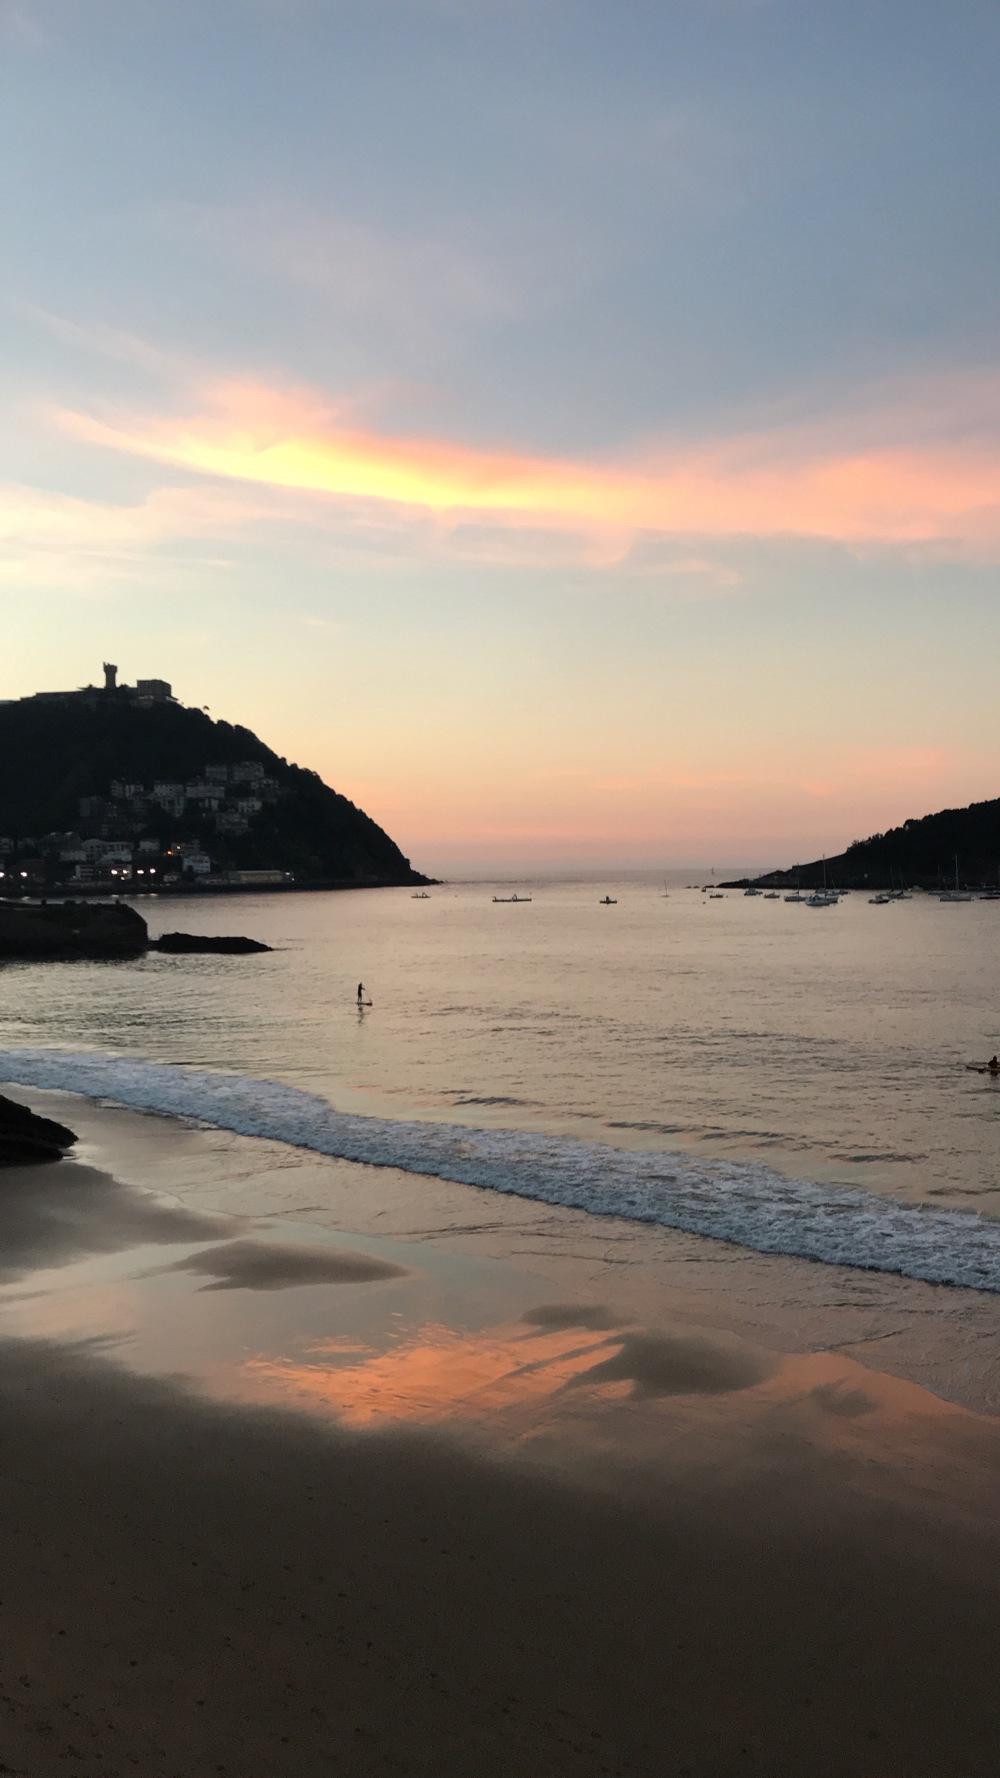 san_sebastian_turismo_playa_mar_atardecer_la_concha_pais_vasco